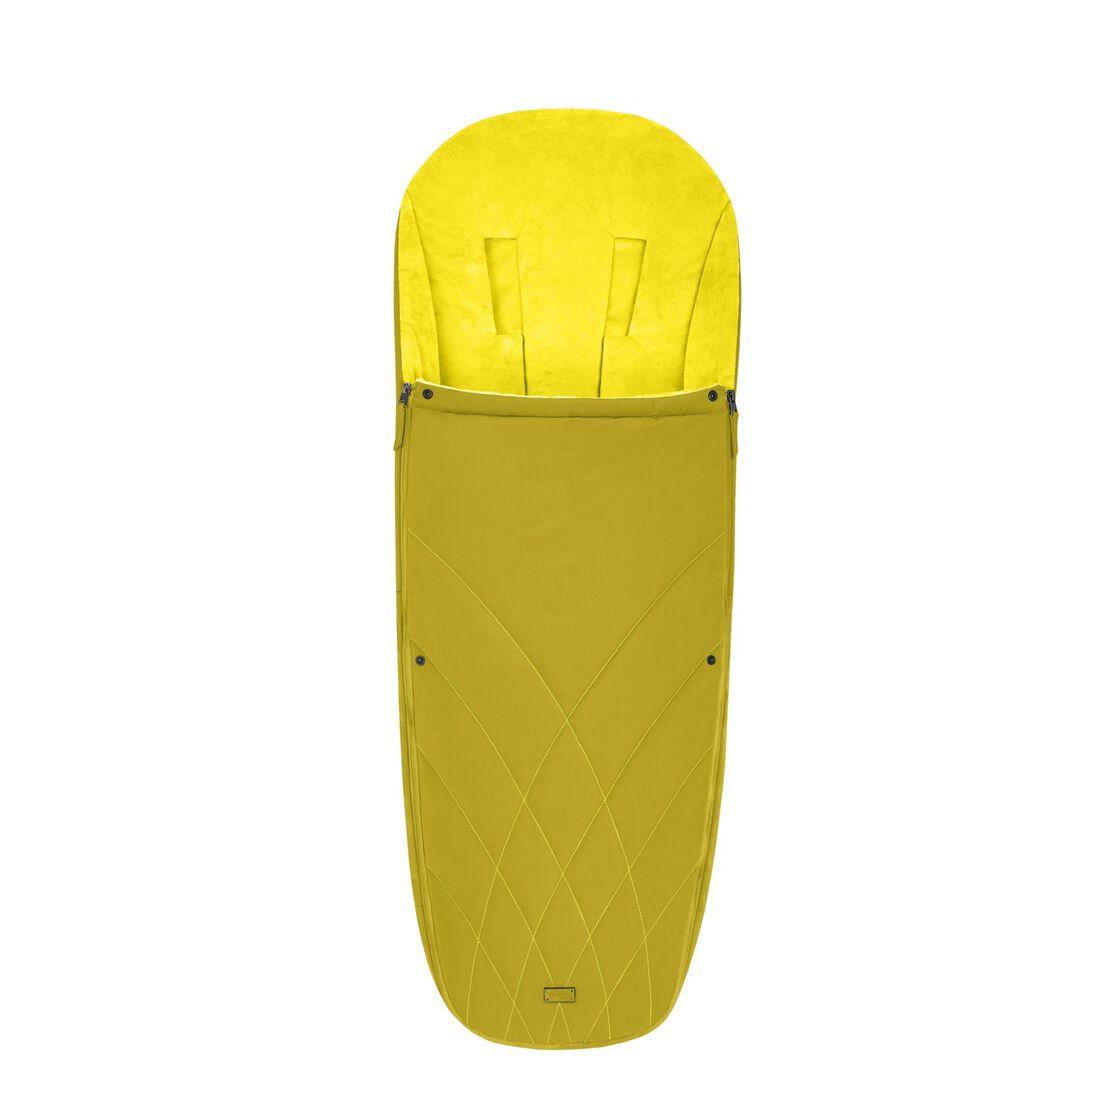 CYBEX Platinum Fußsack - Mustard Yellow in Mustard Yellow large Bild 1